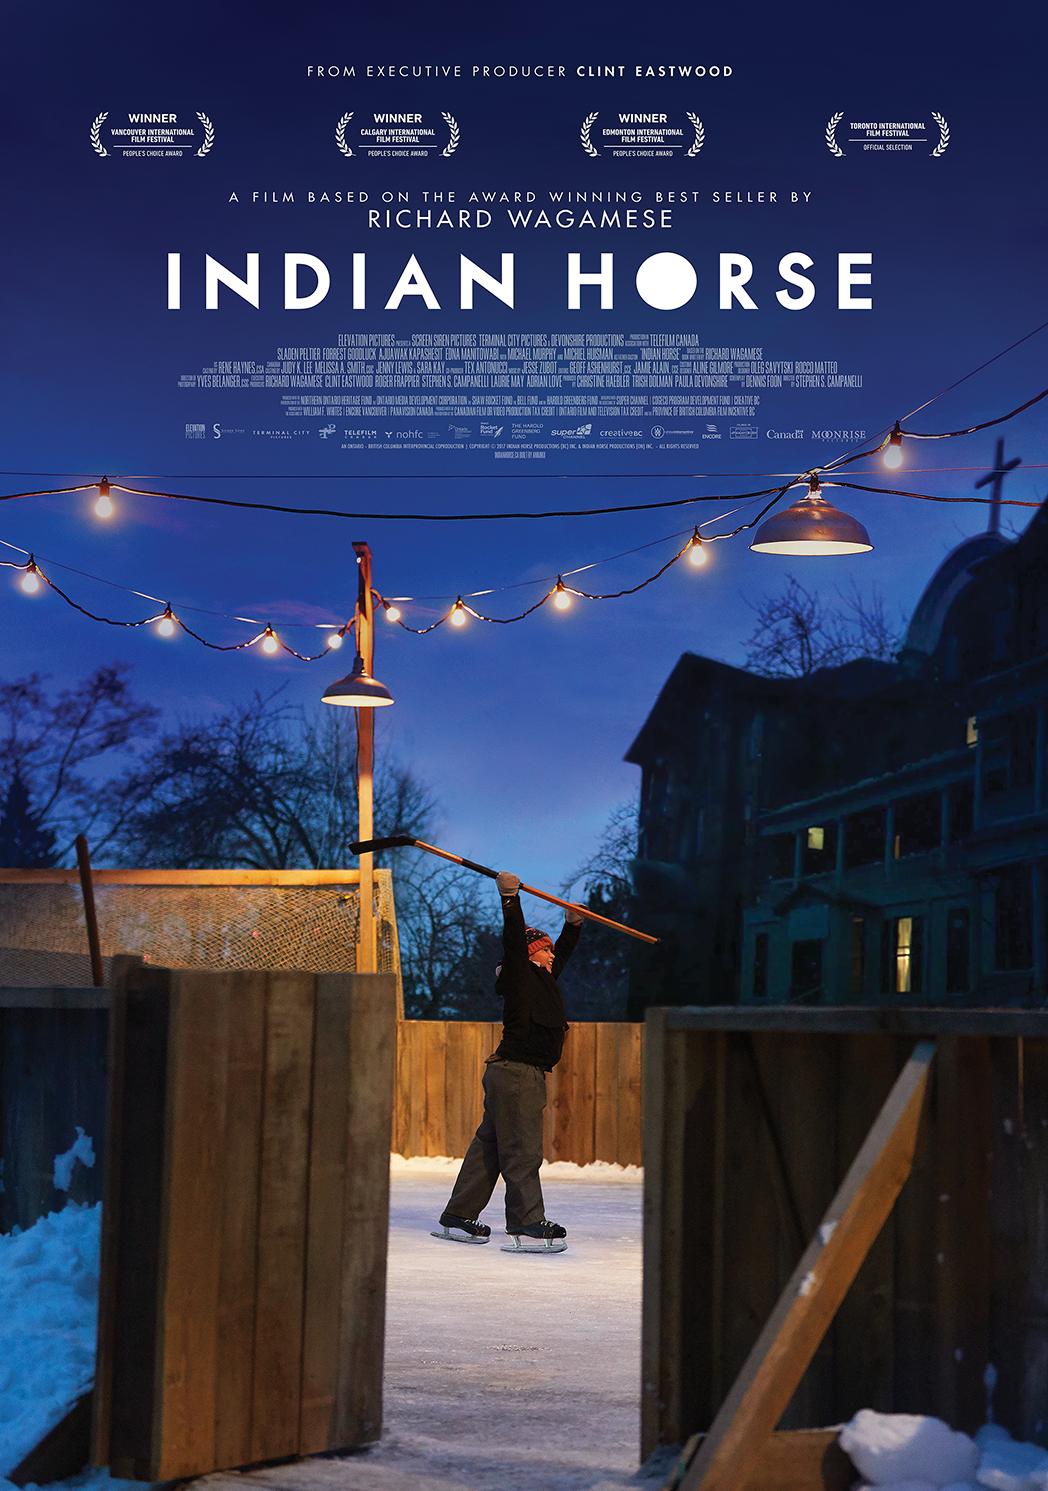 7bf3b4cd03a Indian Horse trailer - https   www.youtube.com watch v 02cyFlnvA4s